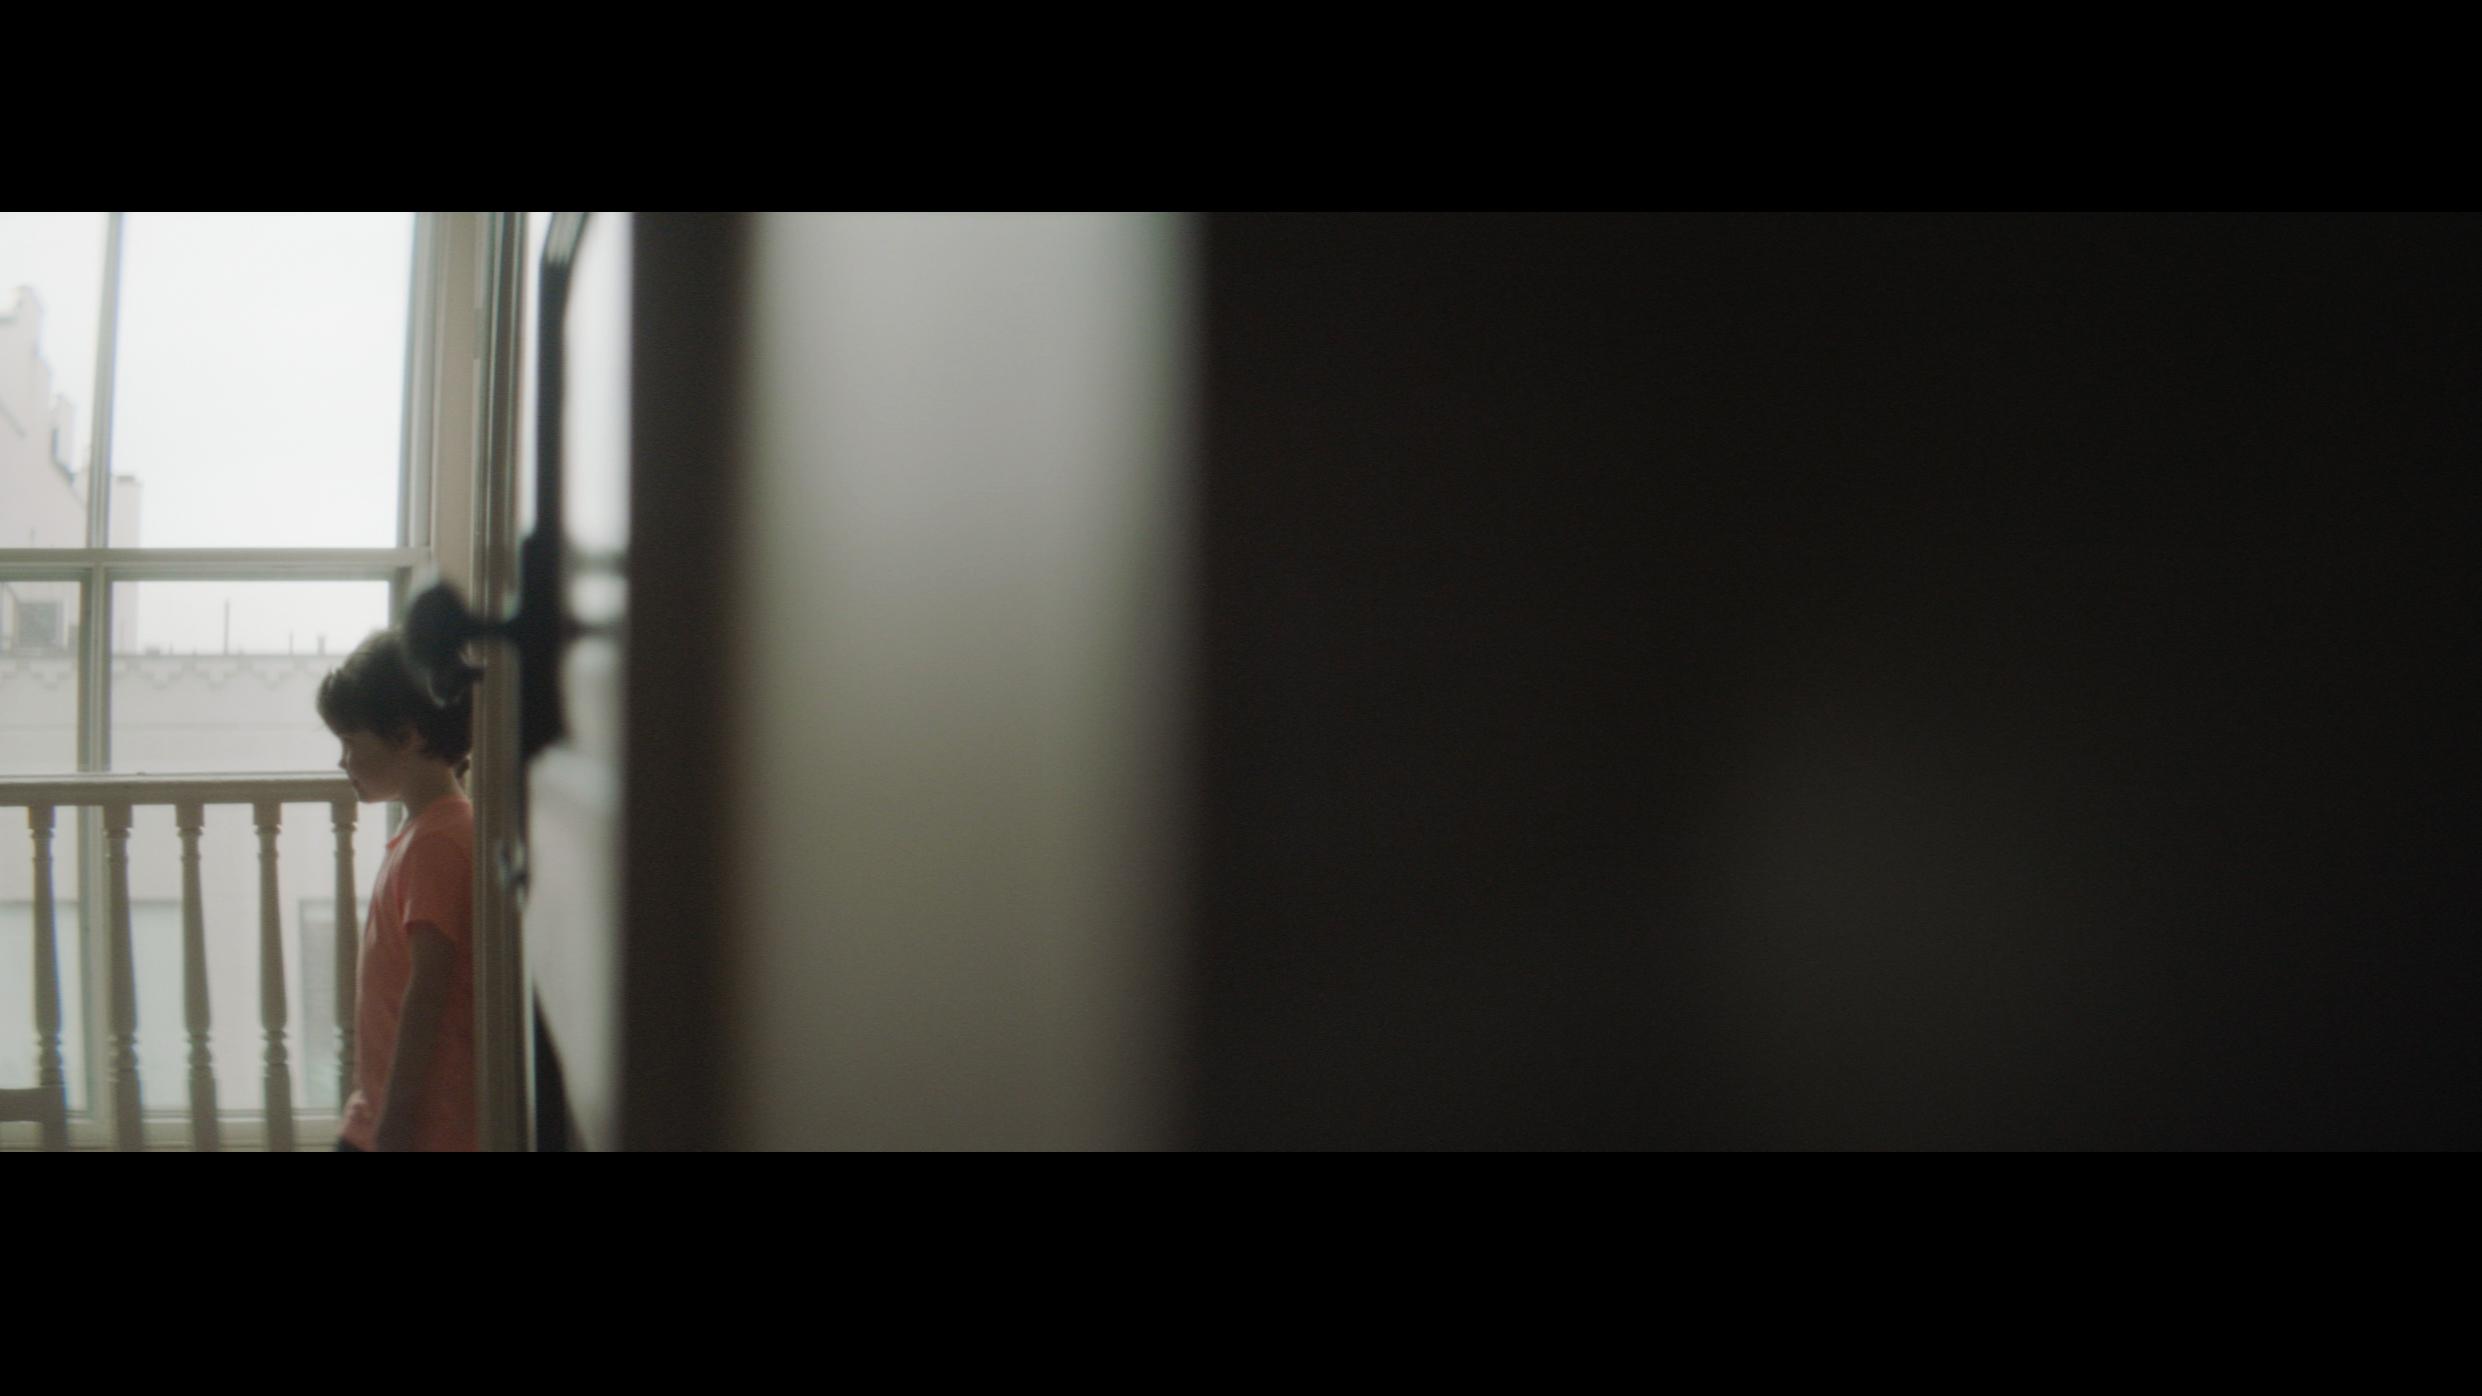 Screen Shot 2018-04-11 at 1.03.00 PM.jpg